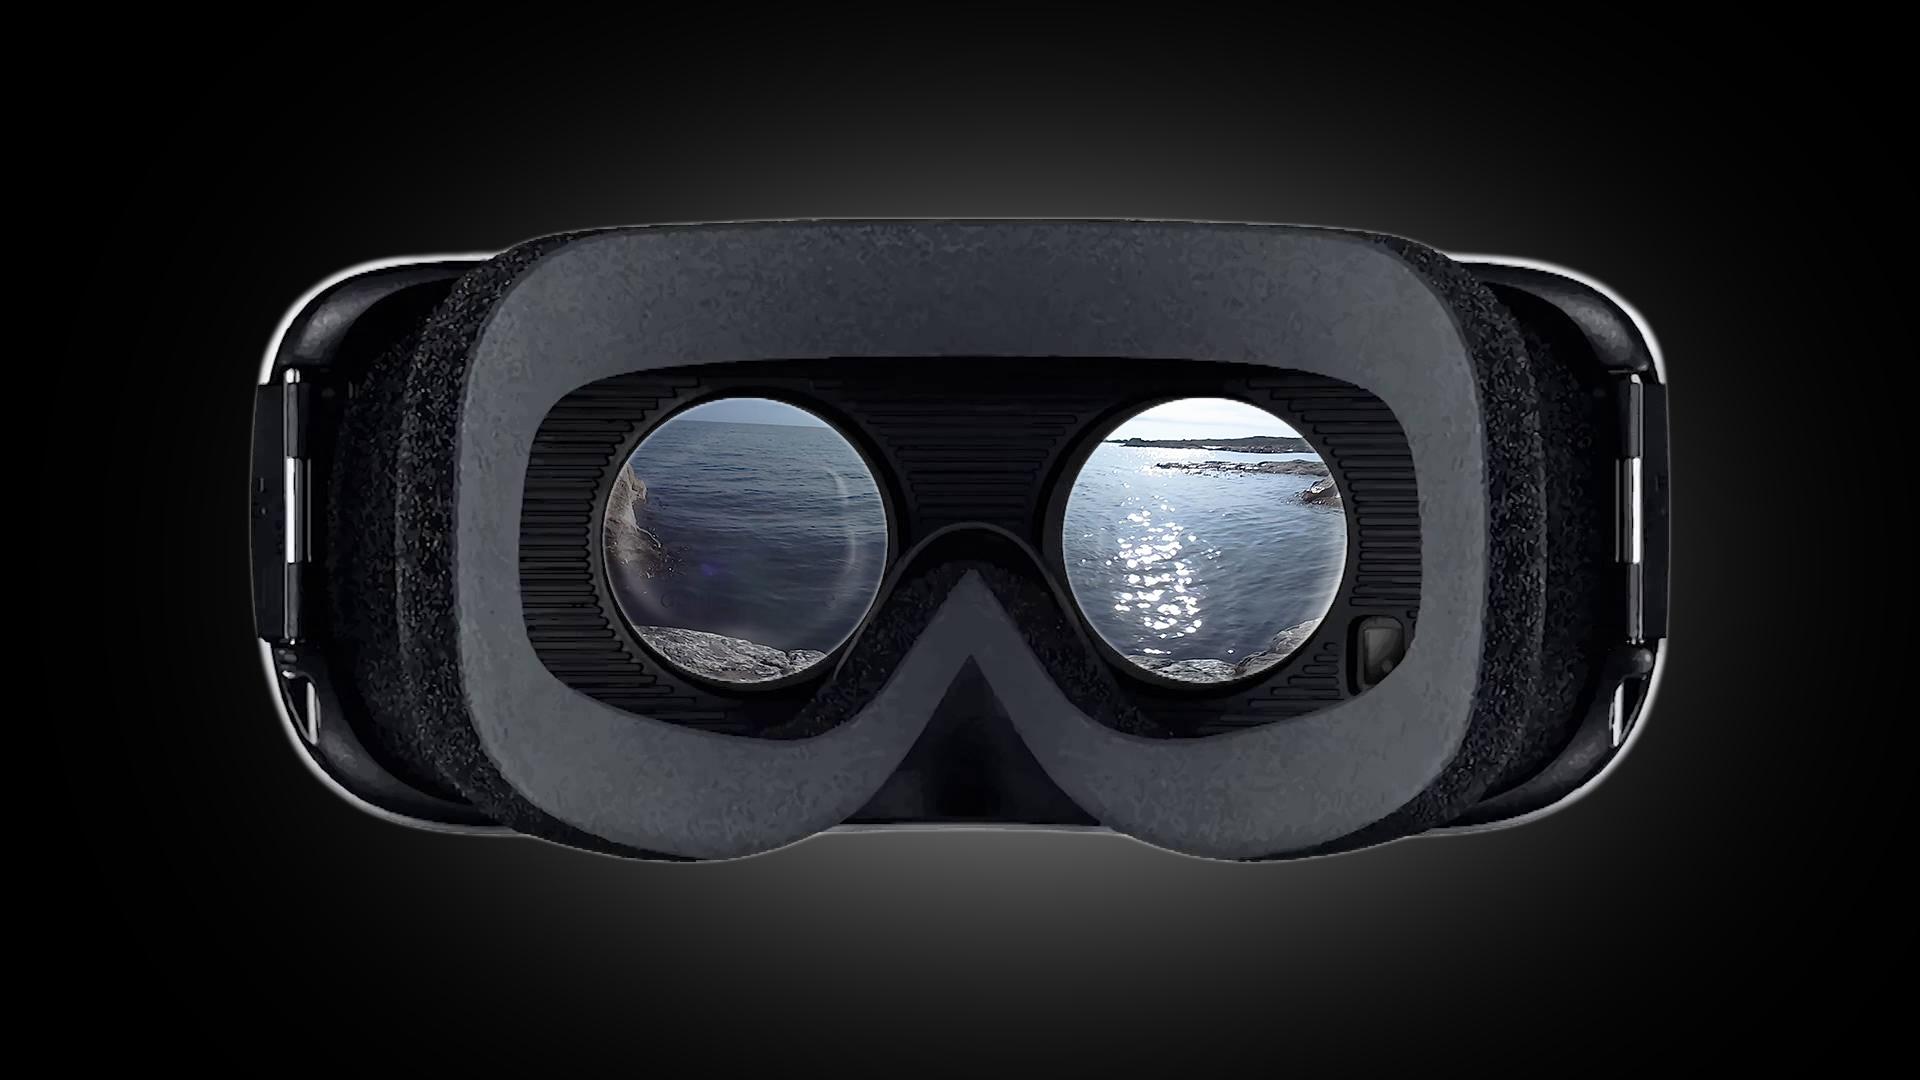 VR_Device_Meer von Ralf Paulzen